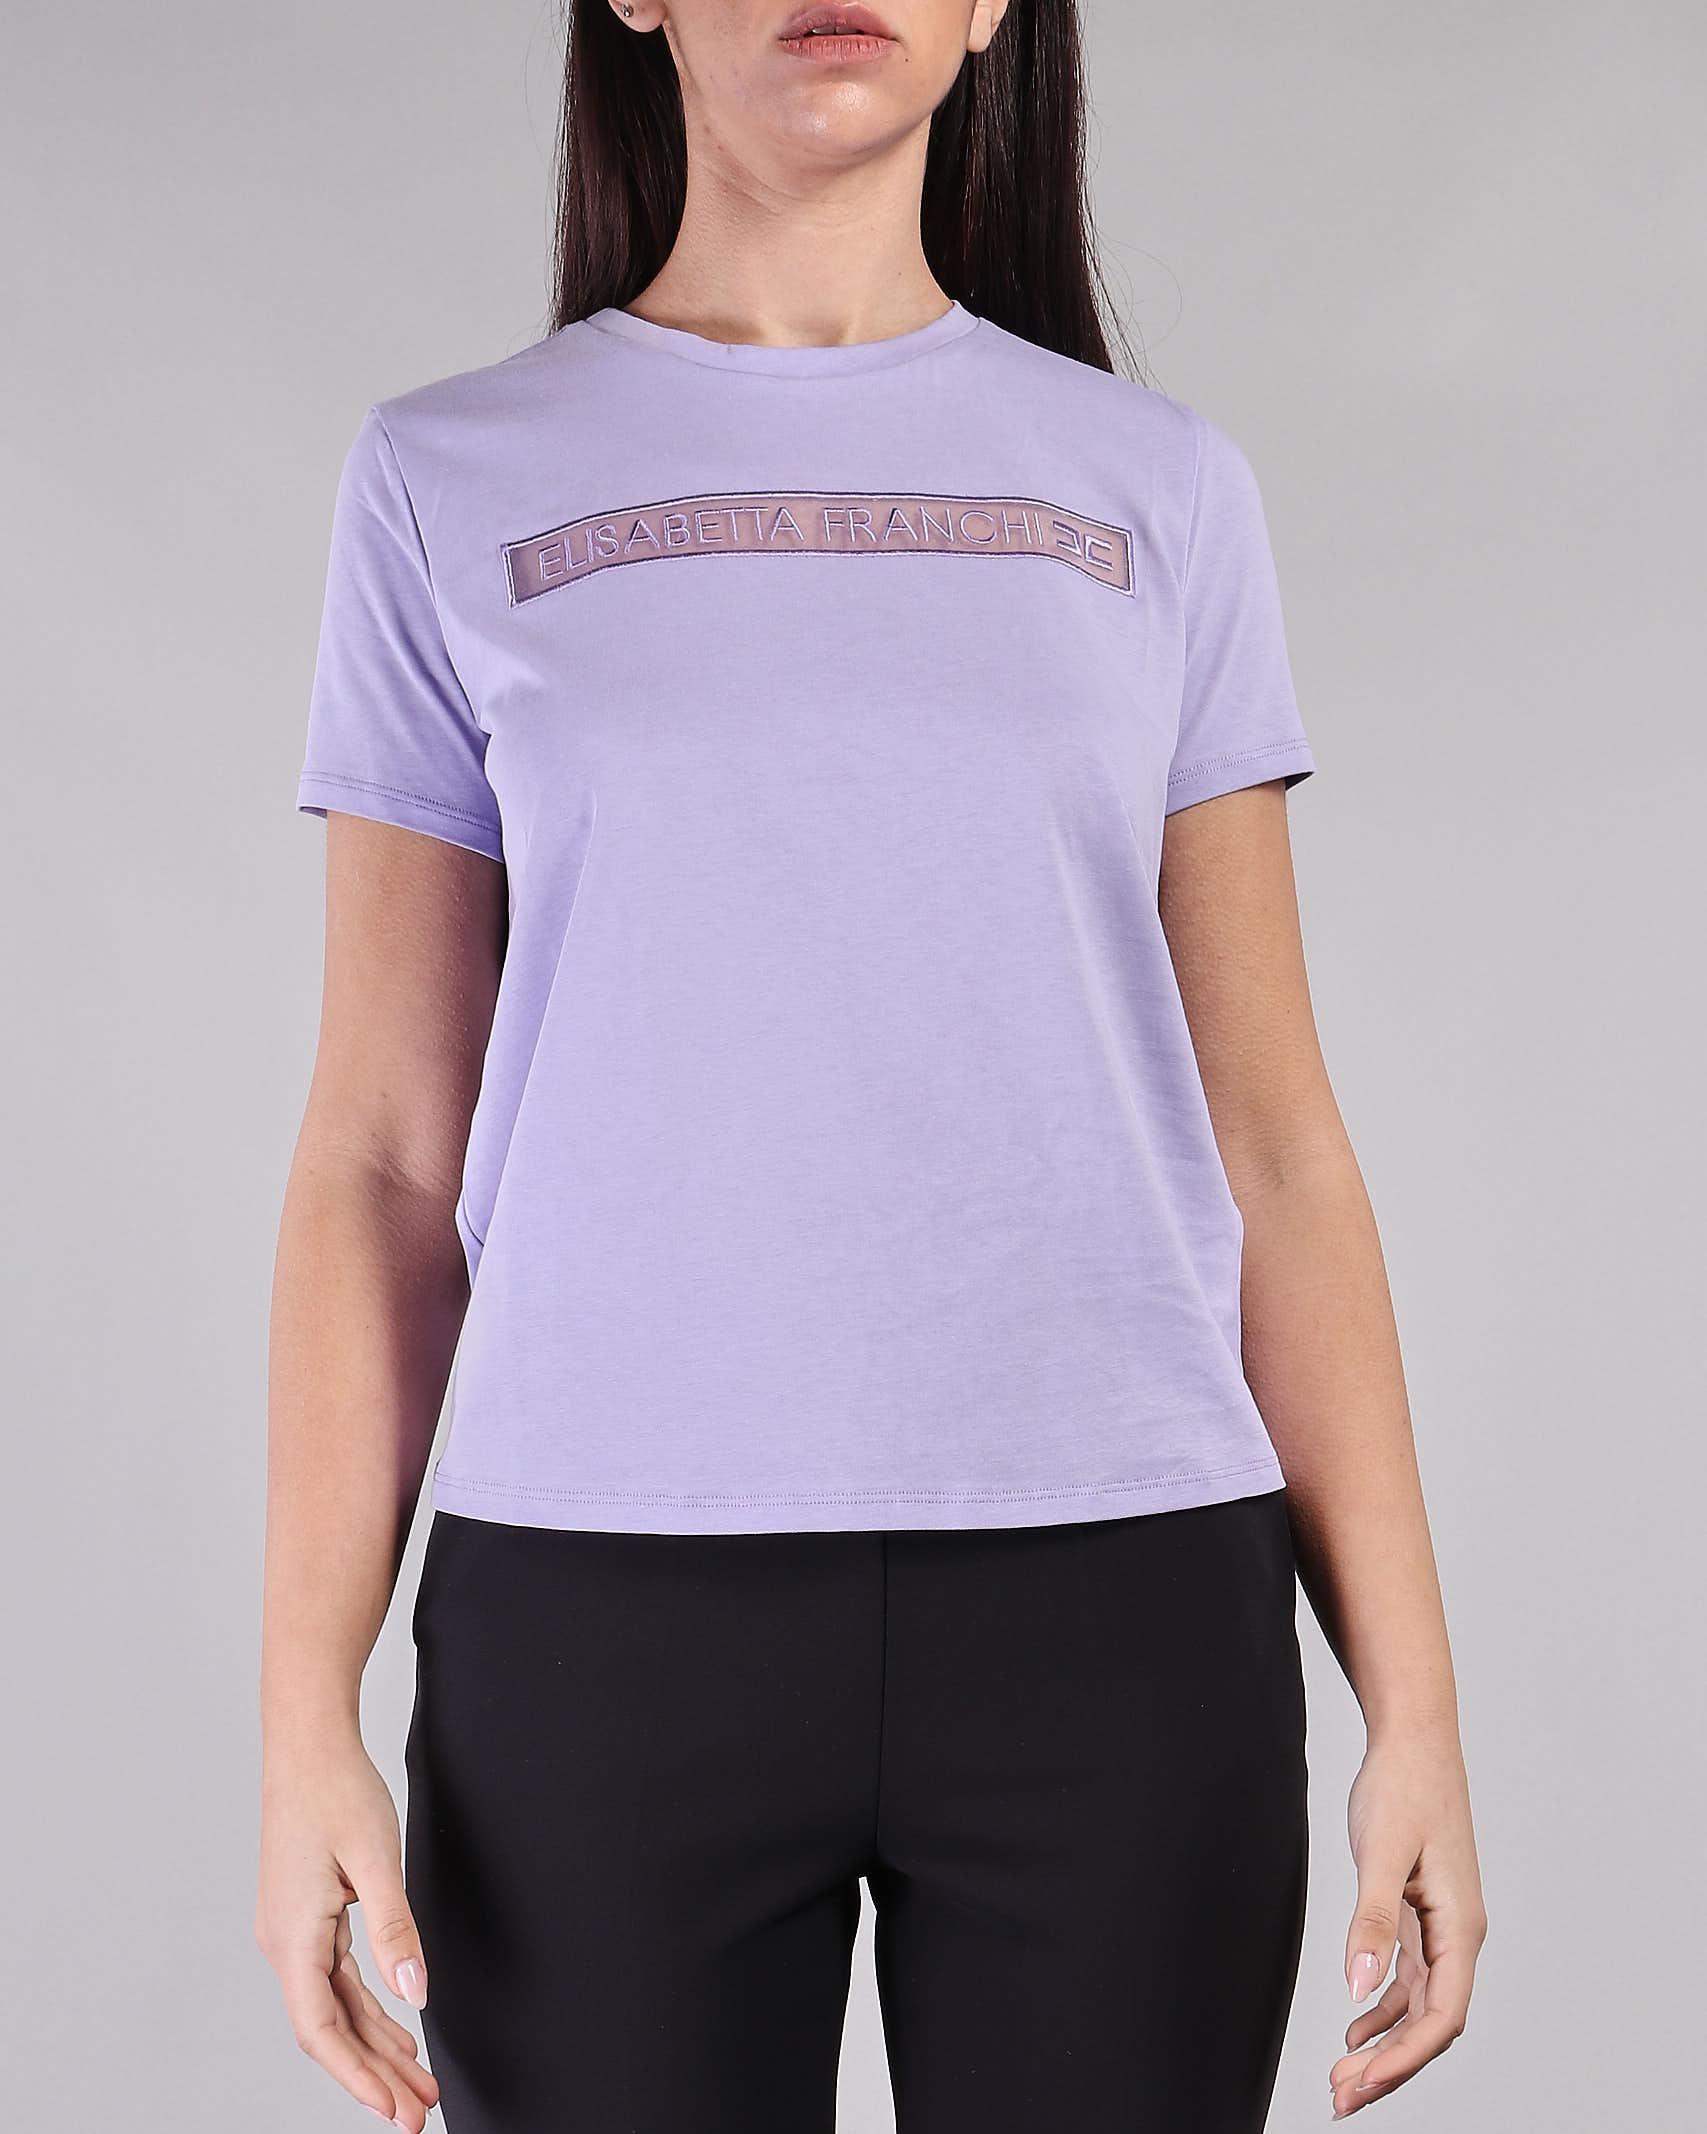 T-shirt con logo ricamato Elisabetta Franchi ELISABETTA FRANCHI | Maglia | MA18411E2Q38